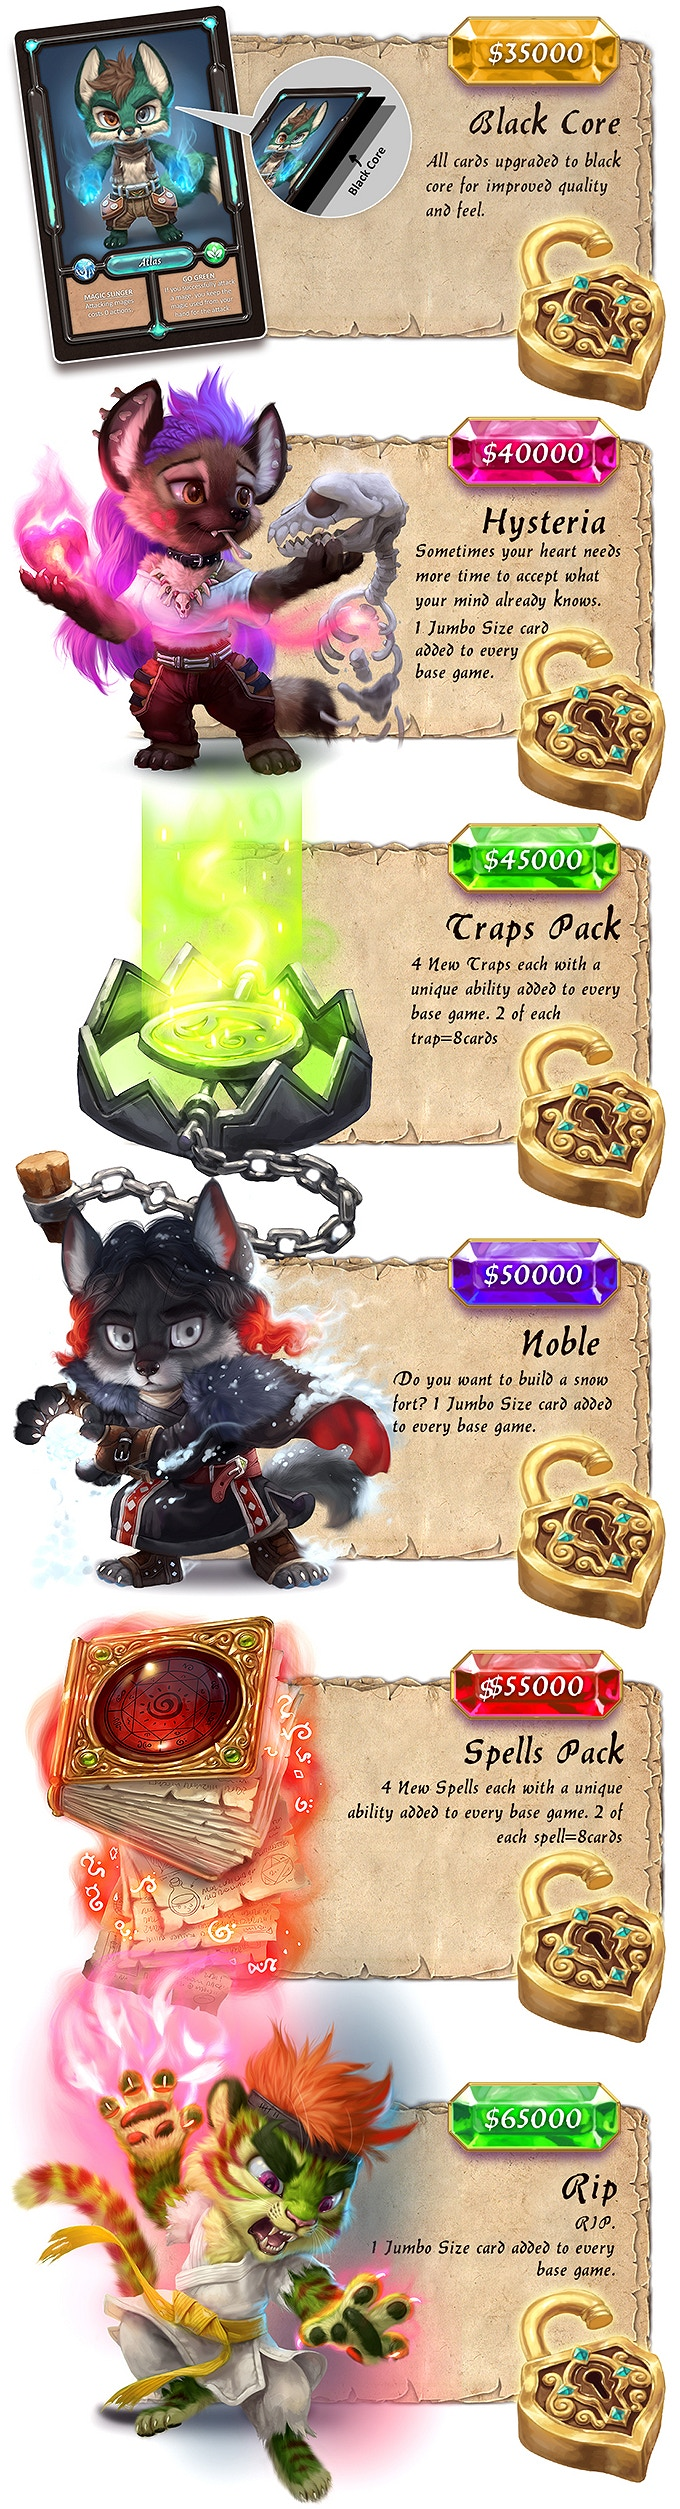 Fuzzy Mage Fight by Shadow Squirrel Games — Kickstarter